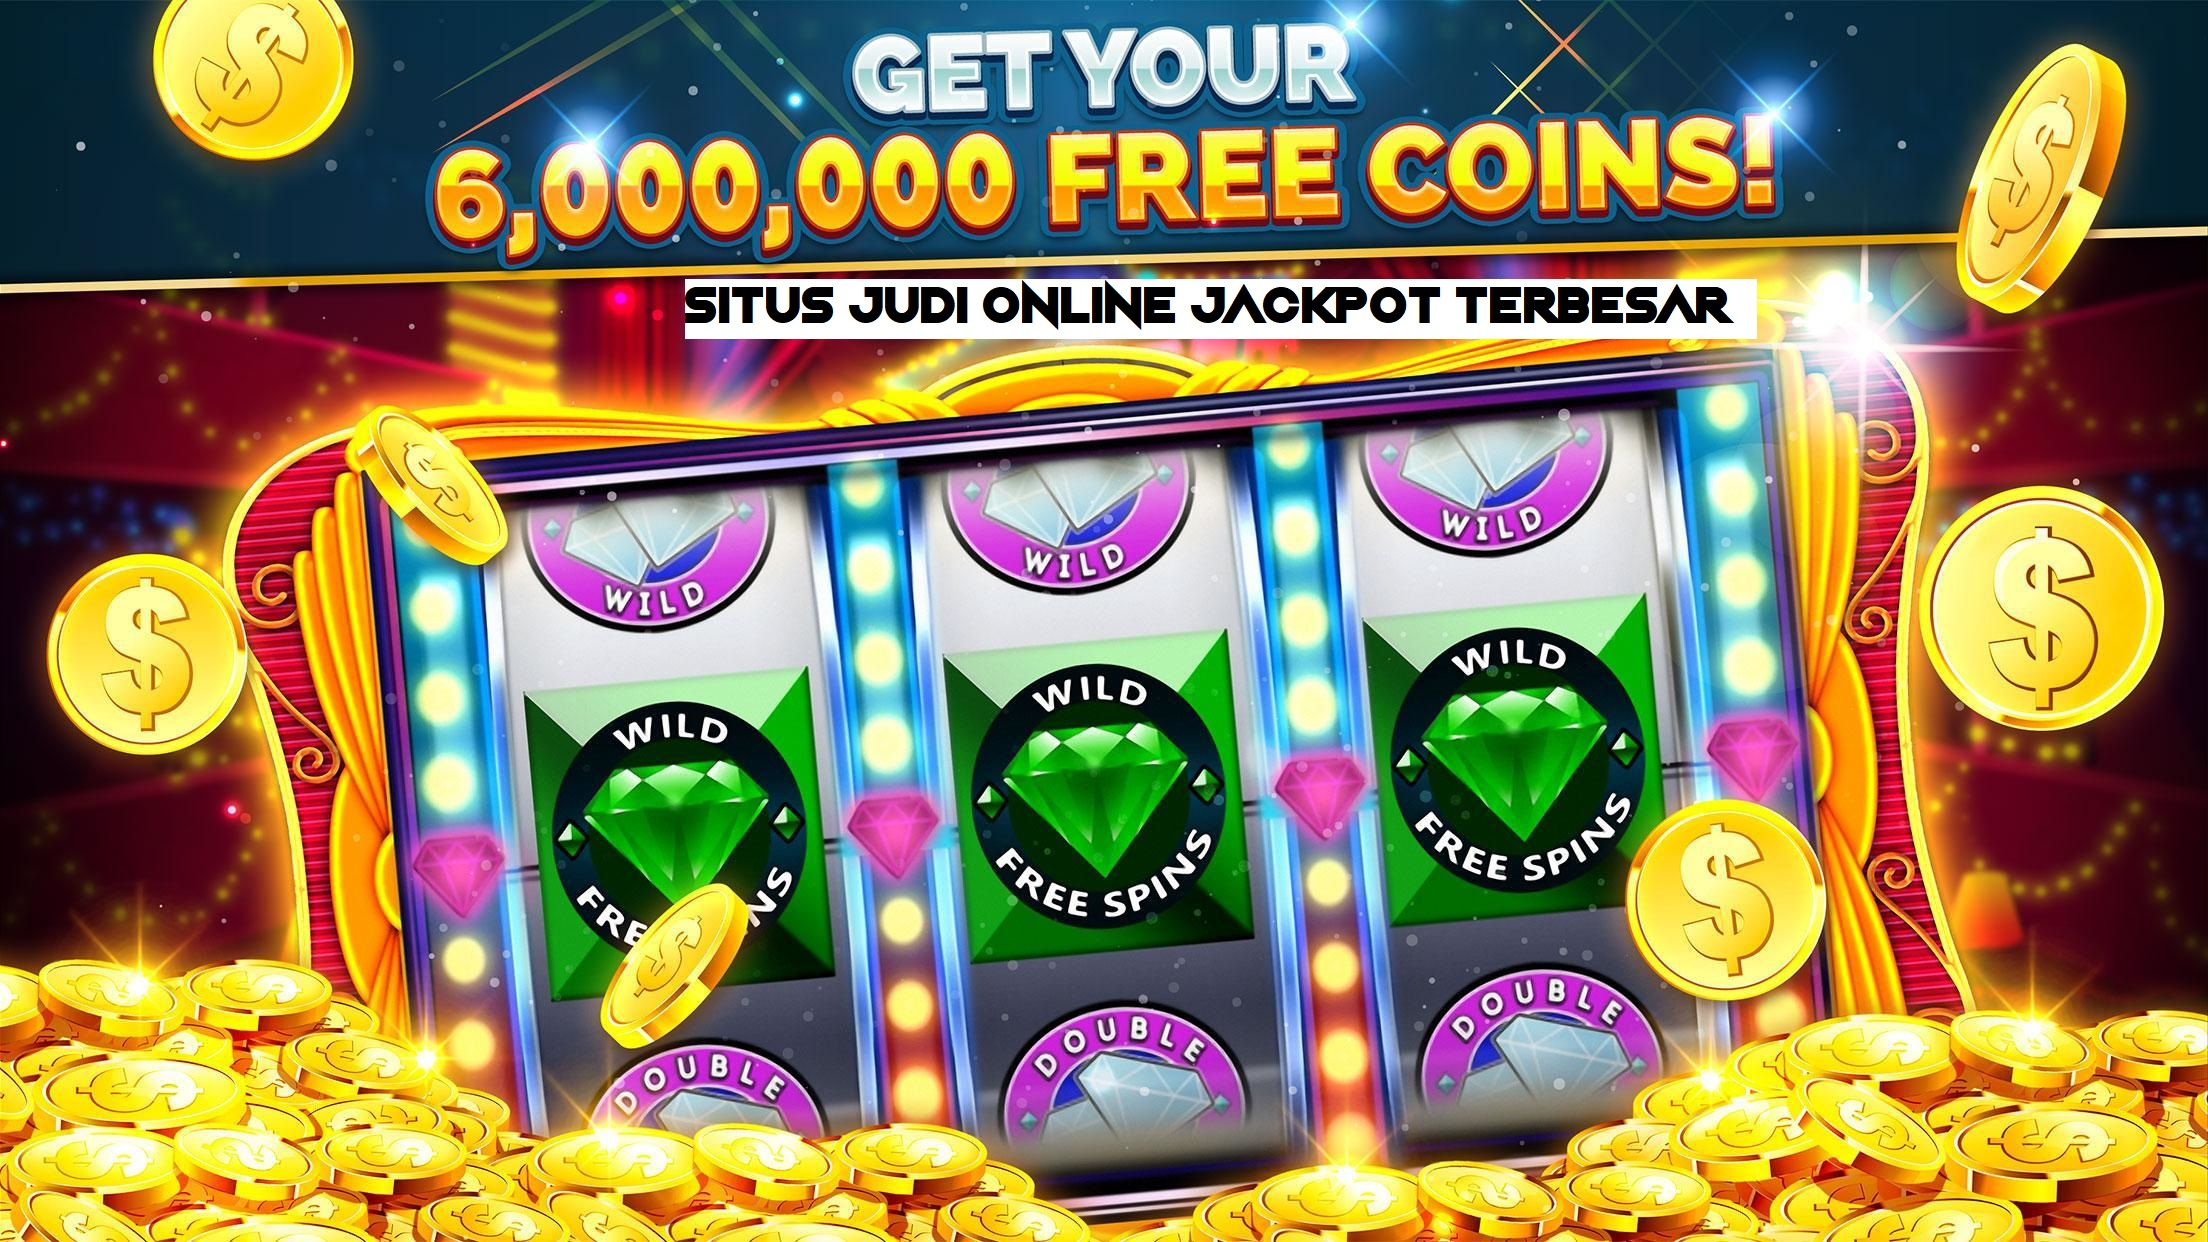 Situs Judi Online Jackpot Terbesar